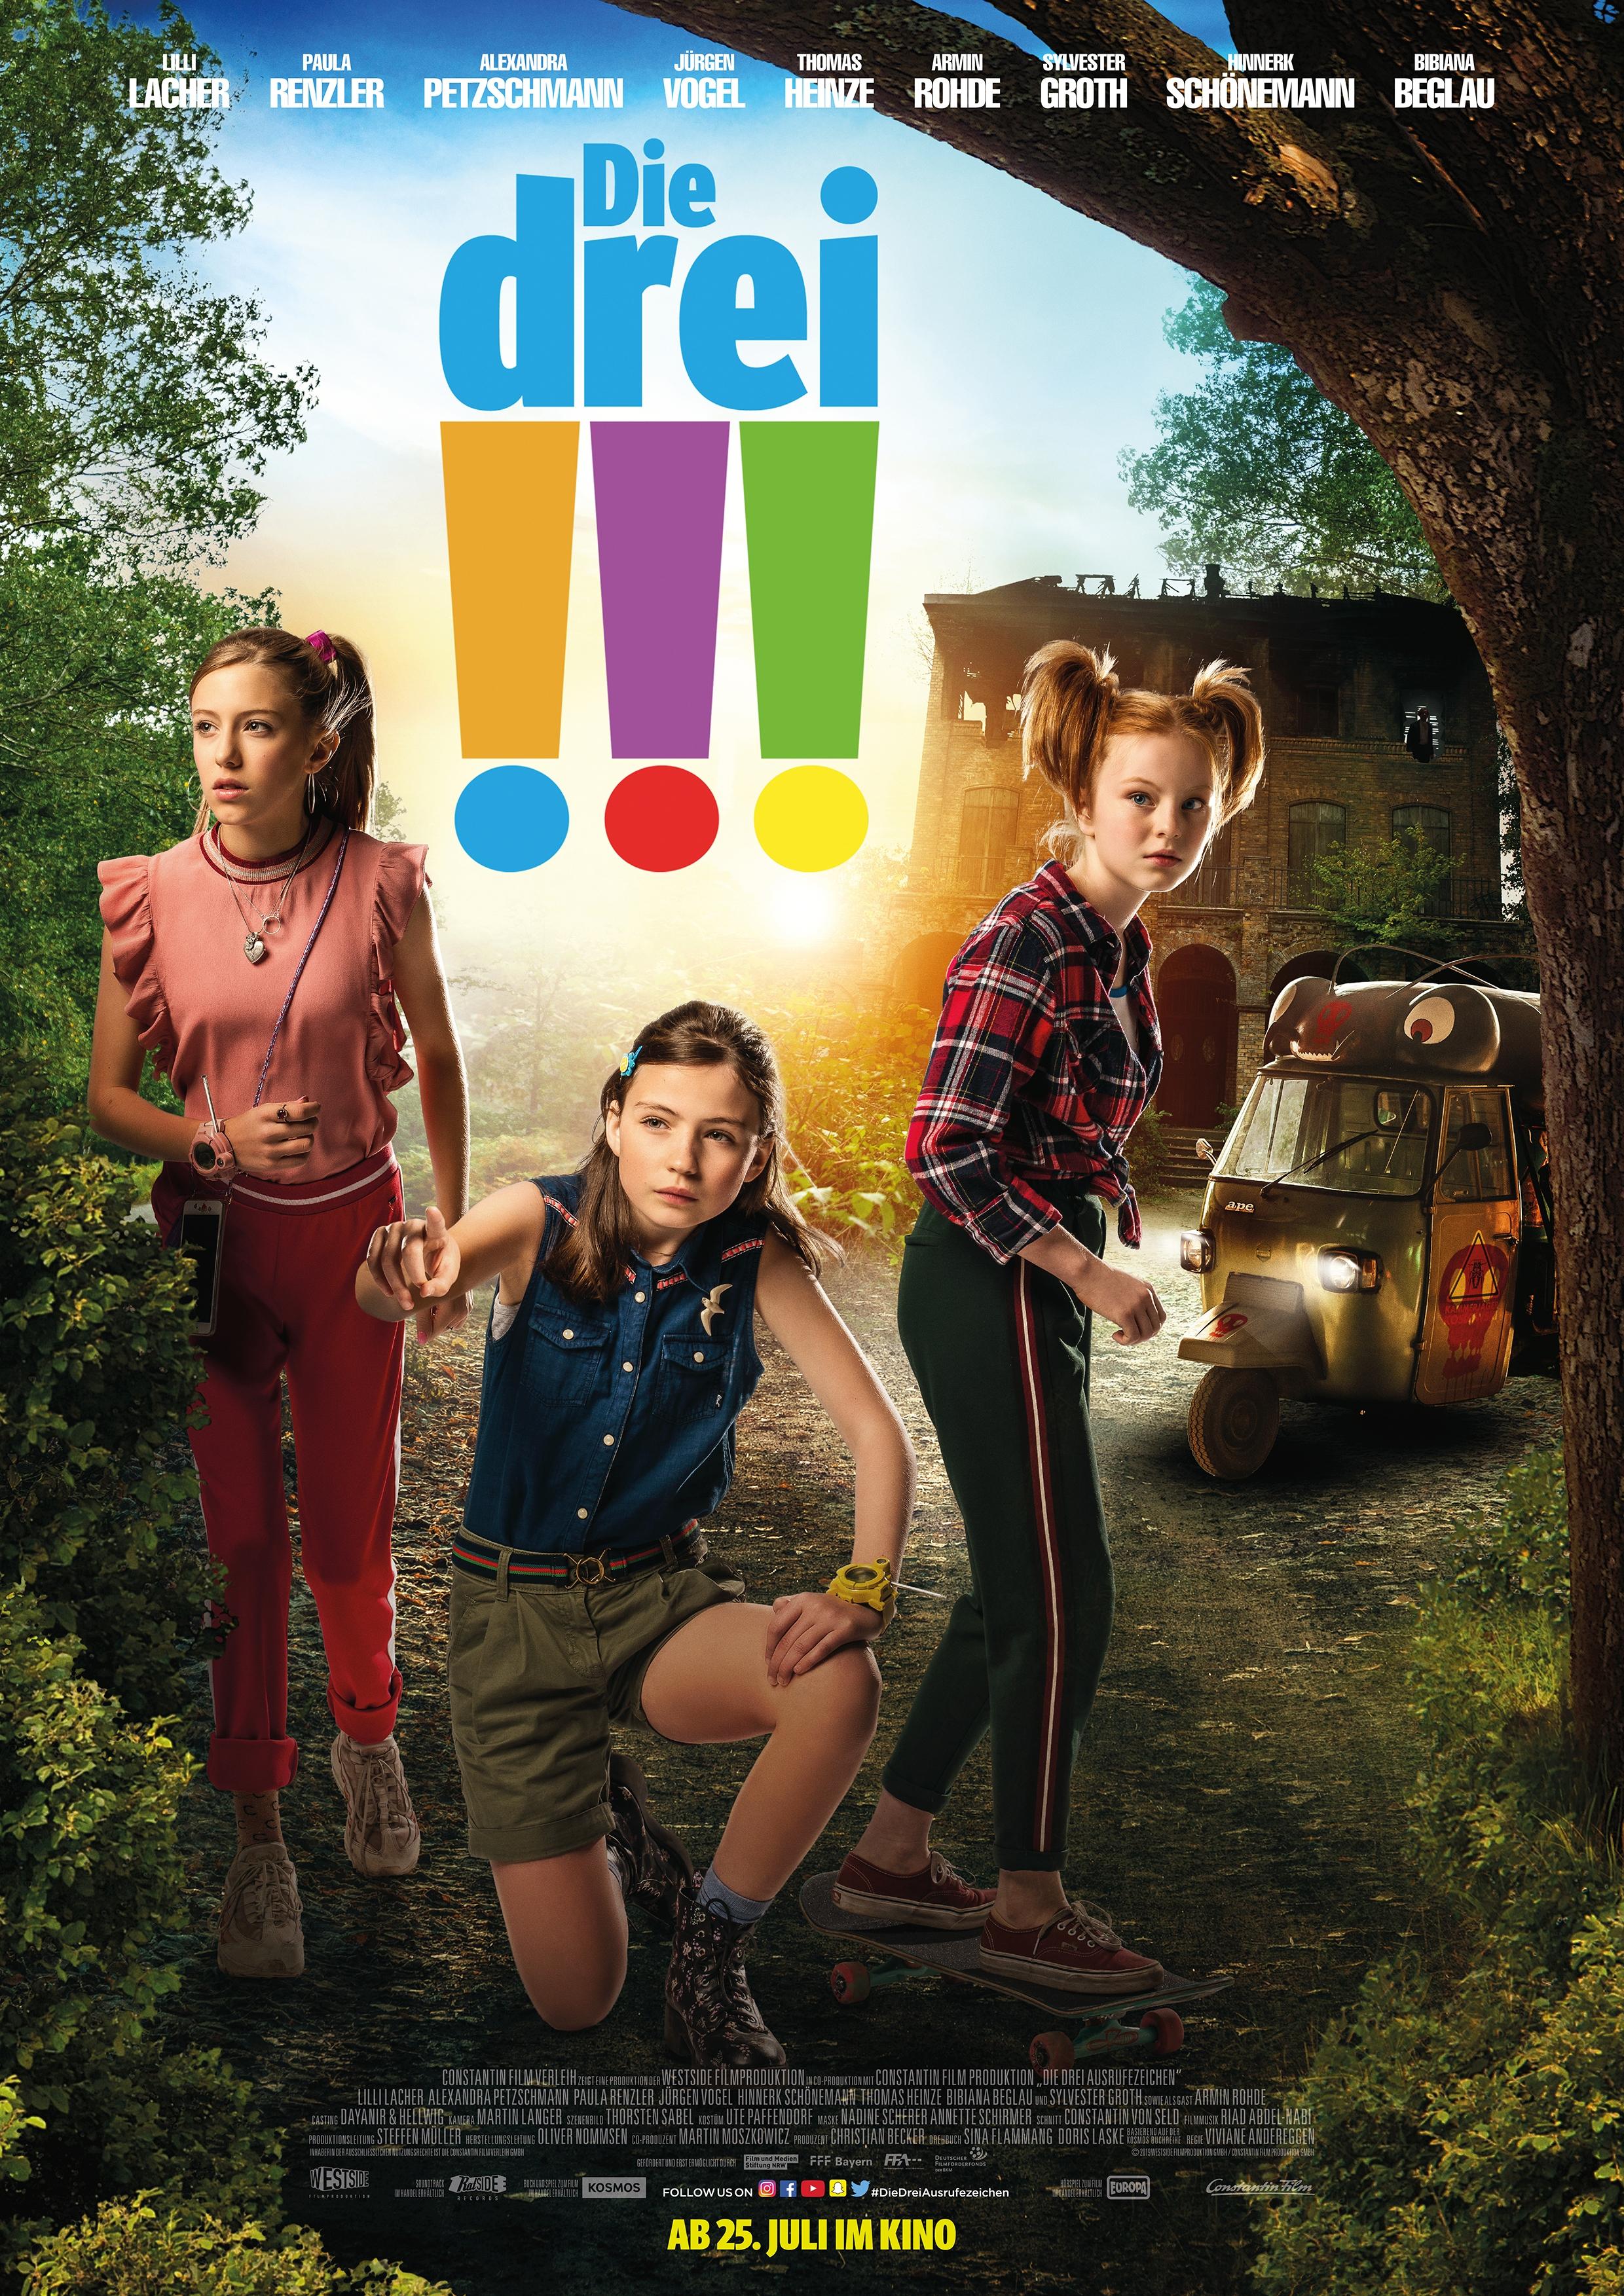 Die Drei Film 2019 Trailer Kritik Kinode